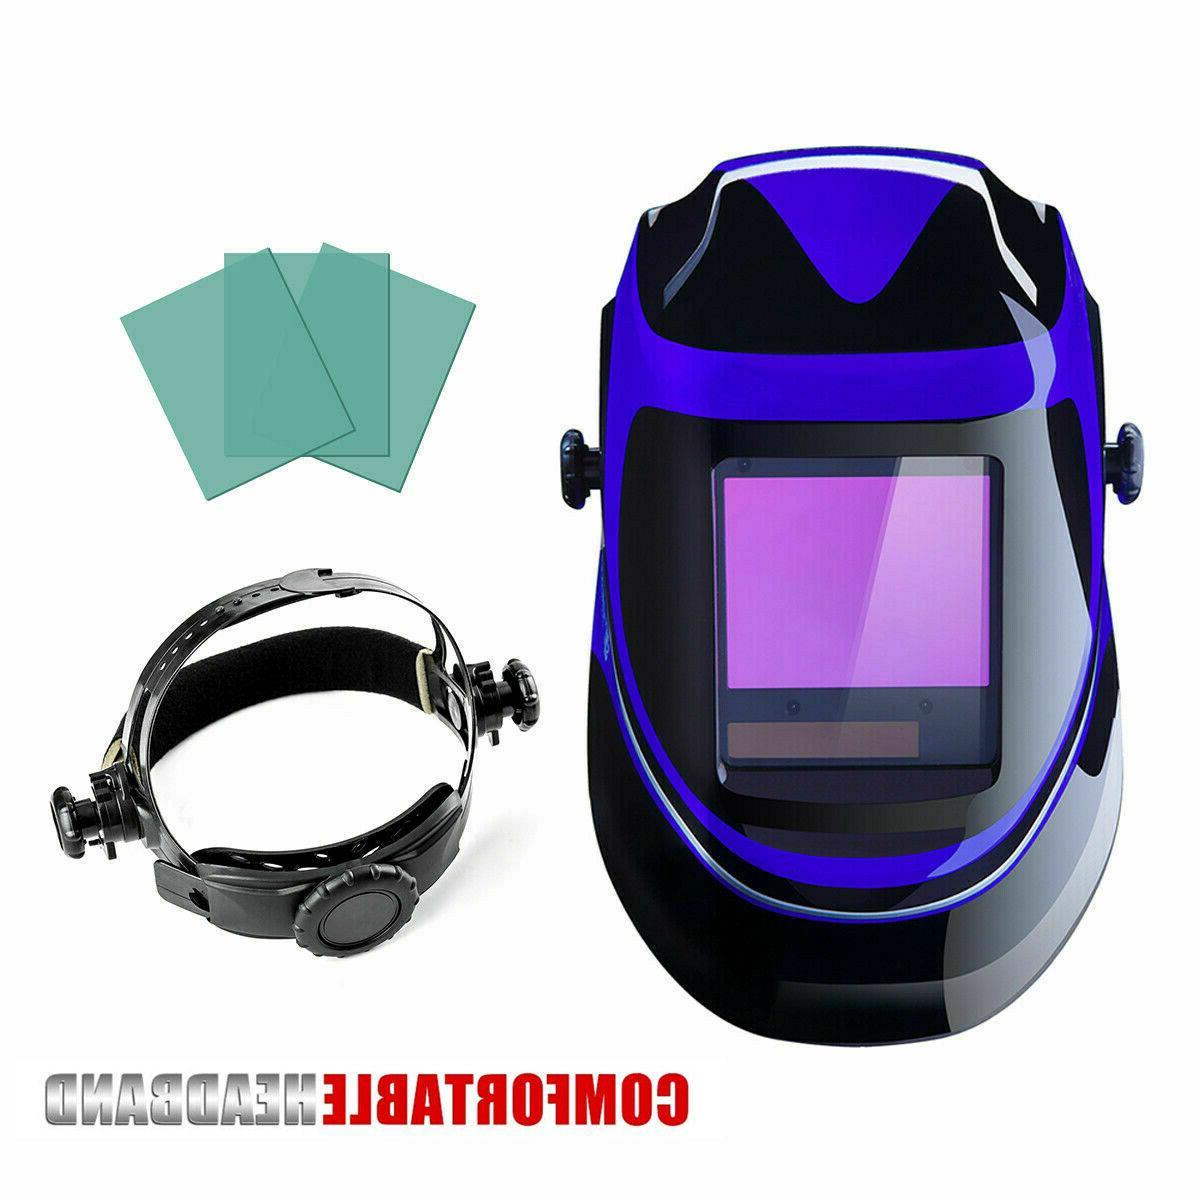 Solar large Auto Darkening Welding Helmet Mask W-3 x Free Pr